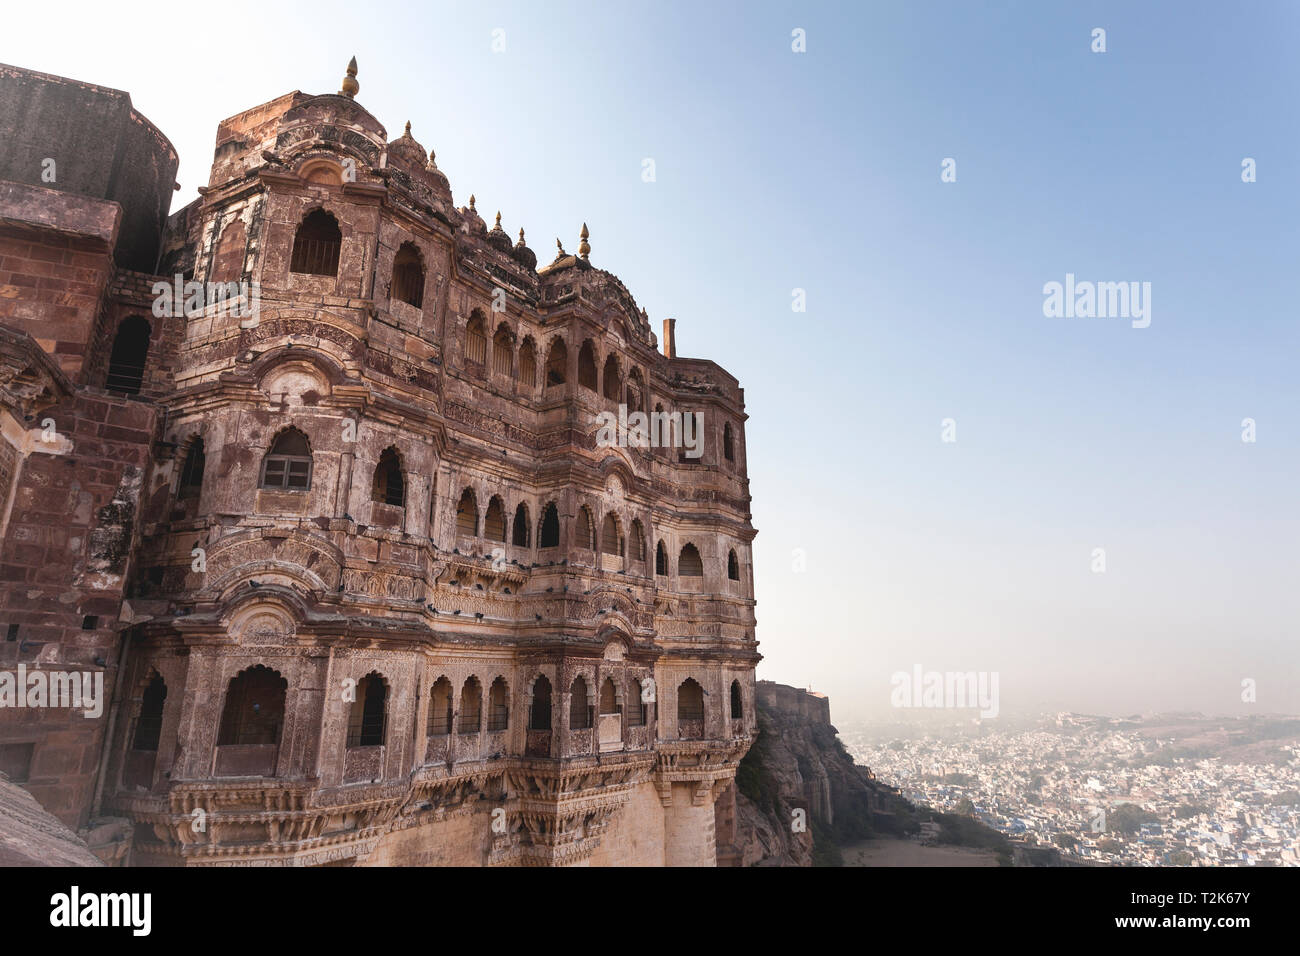 Fort Mehrangarh, Jodhpur, Rajasthan, India Banque D'Images